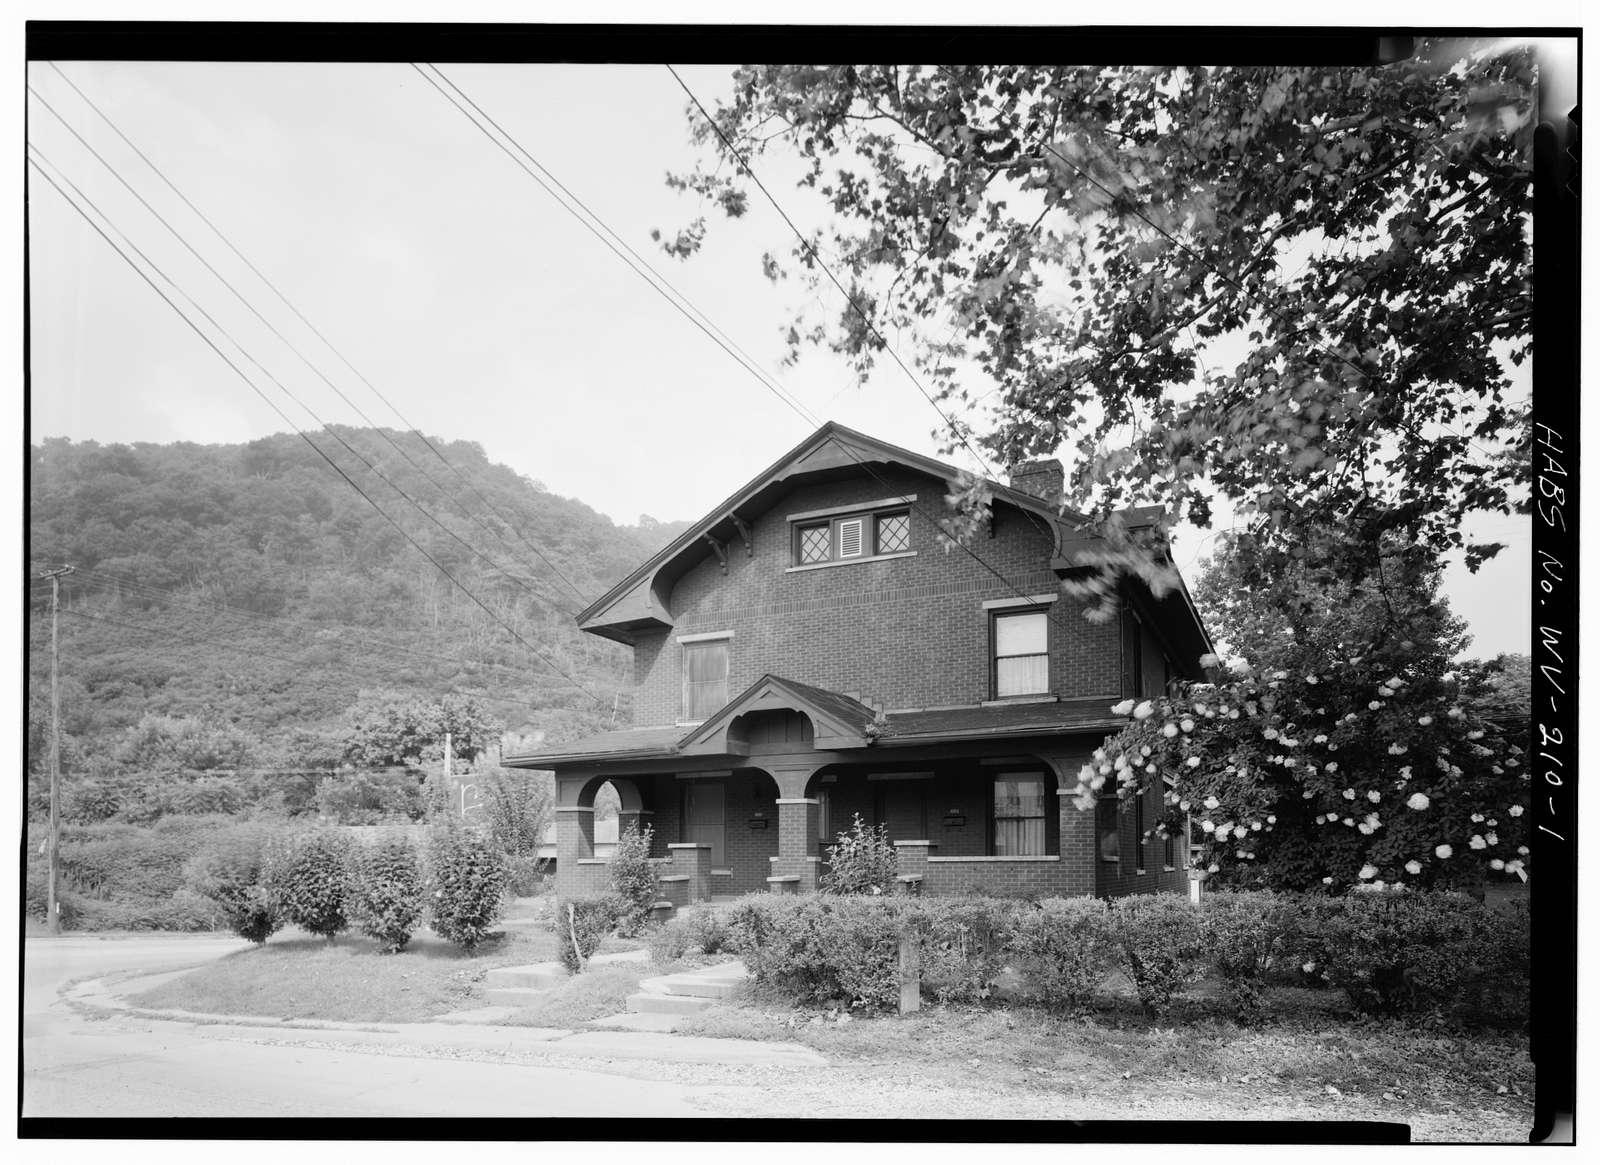 Malden Historic District, 4004 Malden Drive (House), Malden, Kanawha County, WV